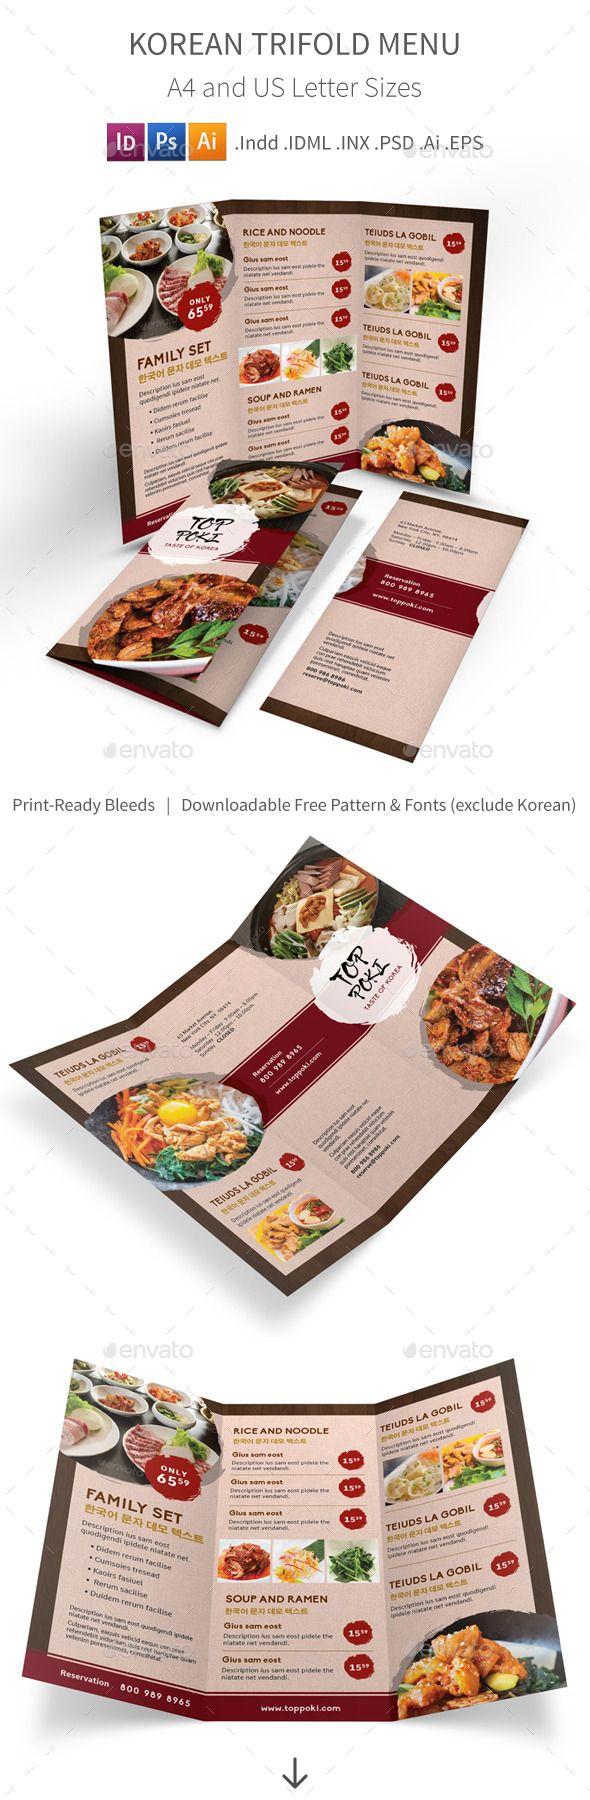 Korean Restaurant Trifold Menu Design Tempalte Download: http://graphicriver.net/item/korean-restaurant-trifold-menu/12938638?ref=ksioks